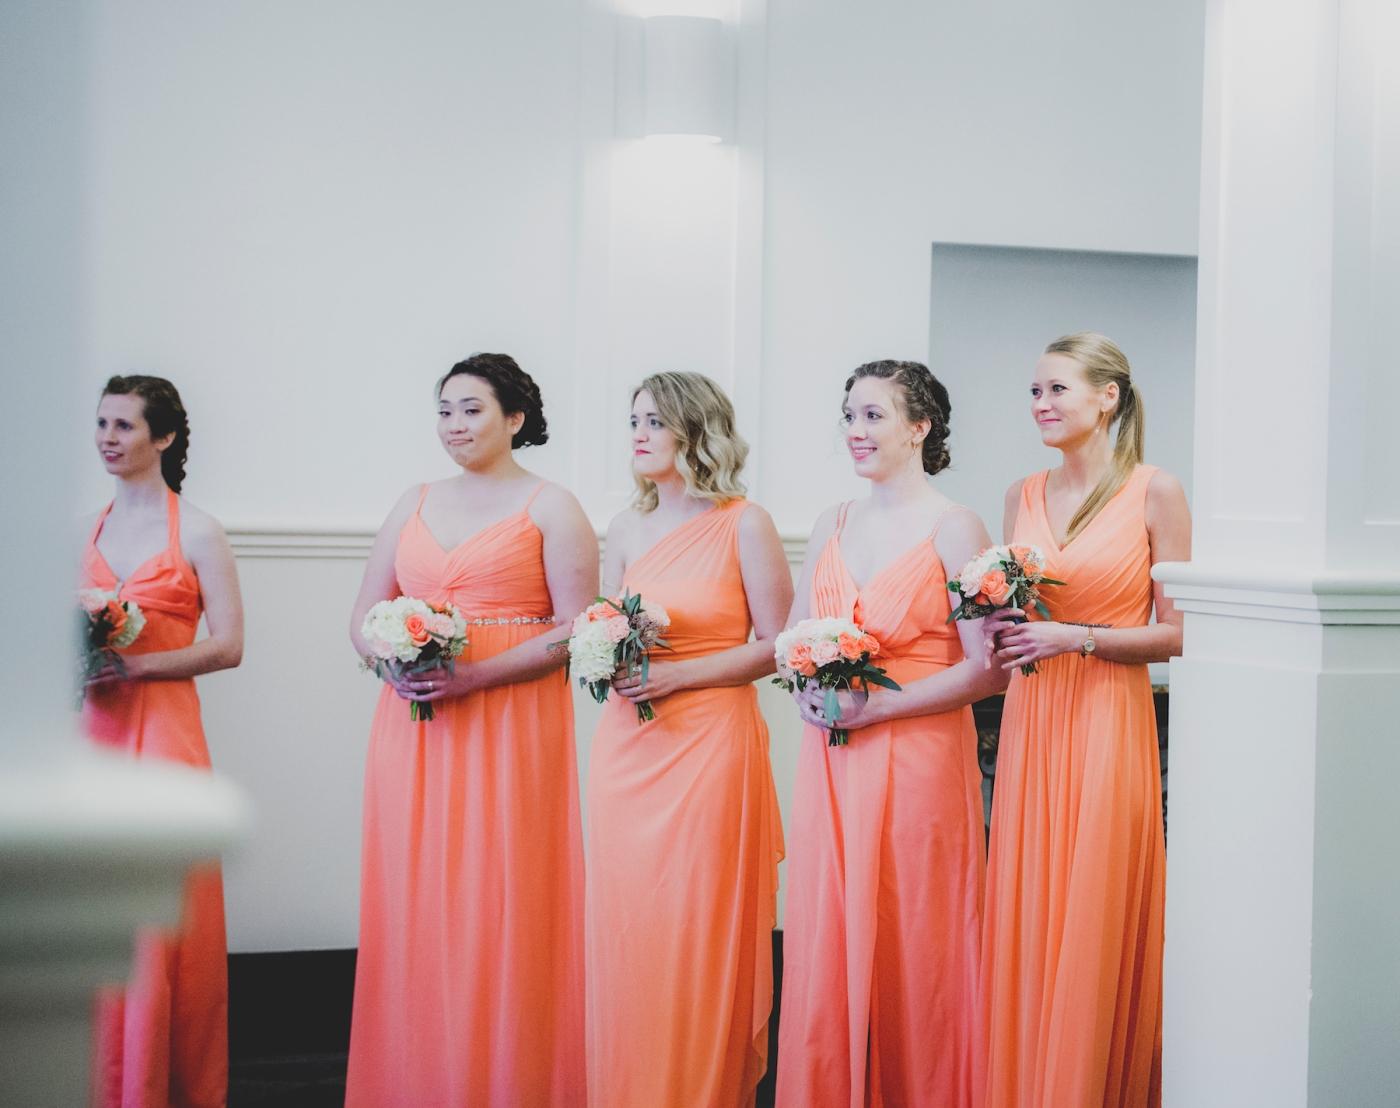 DSC_2552Everett_Wedding_Ballroom_Jane_Speleers_photography_Rachel_and_Edmund_Ceremony_2017